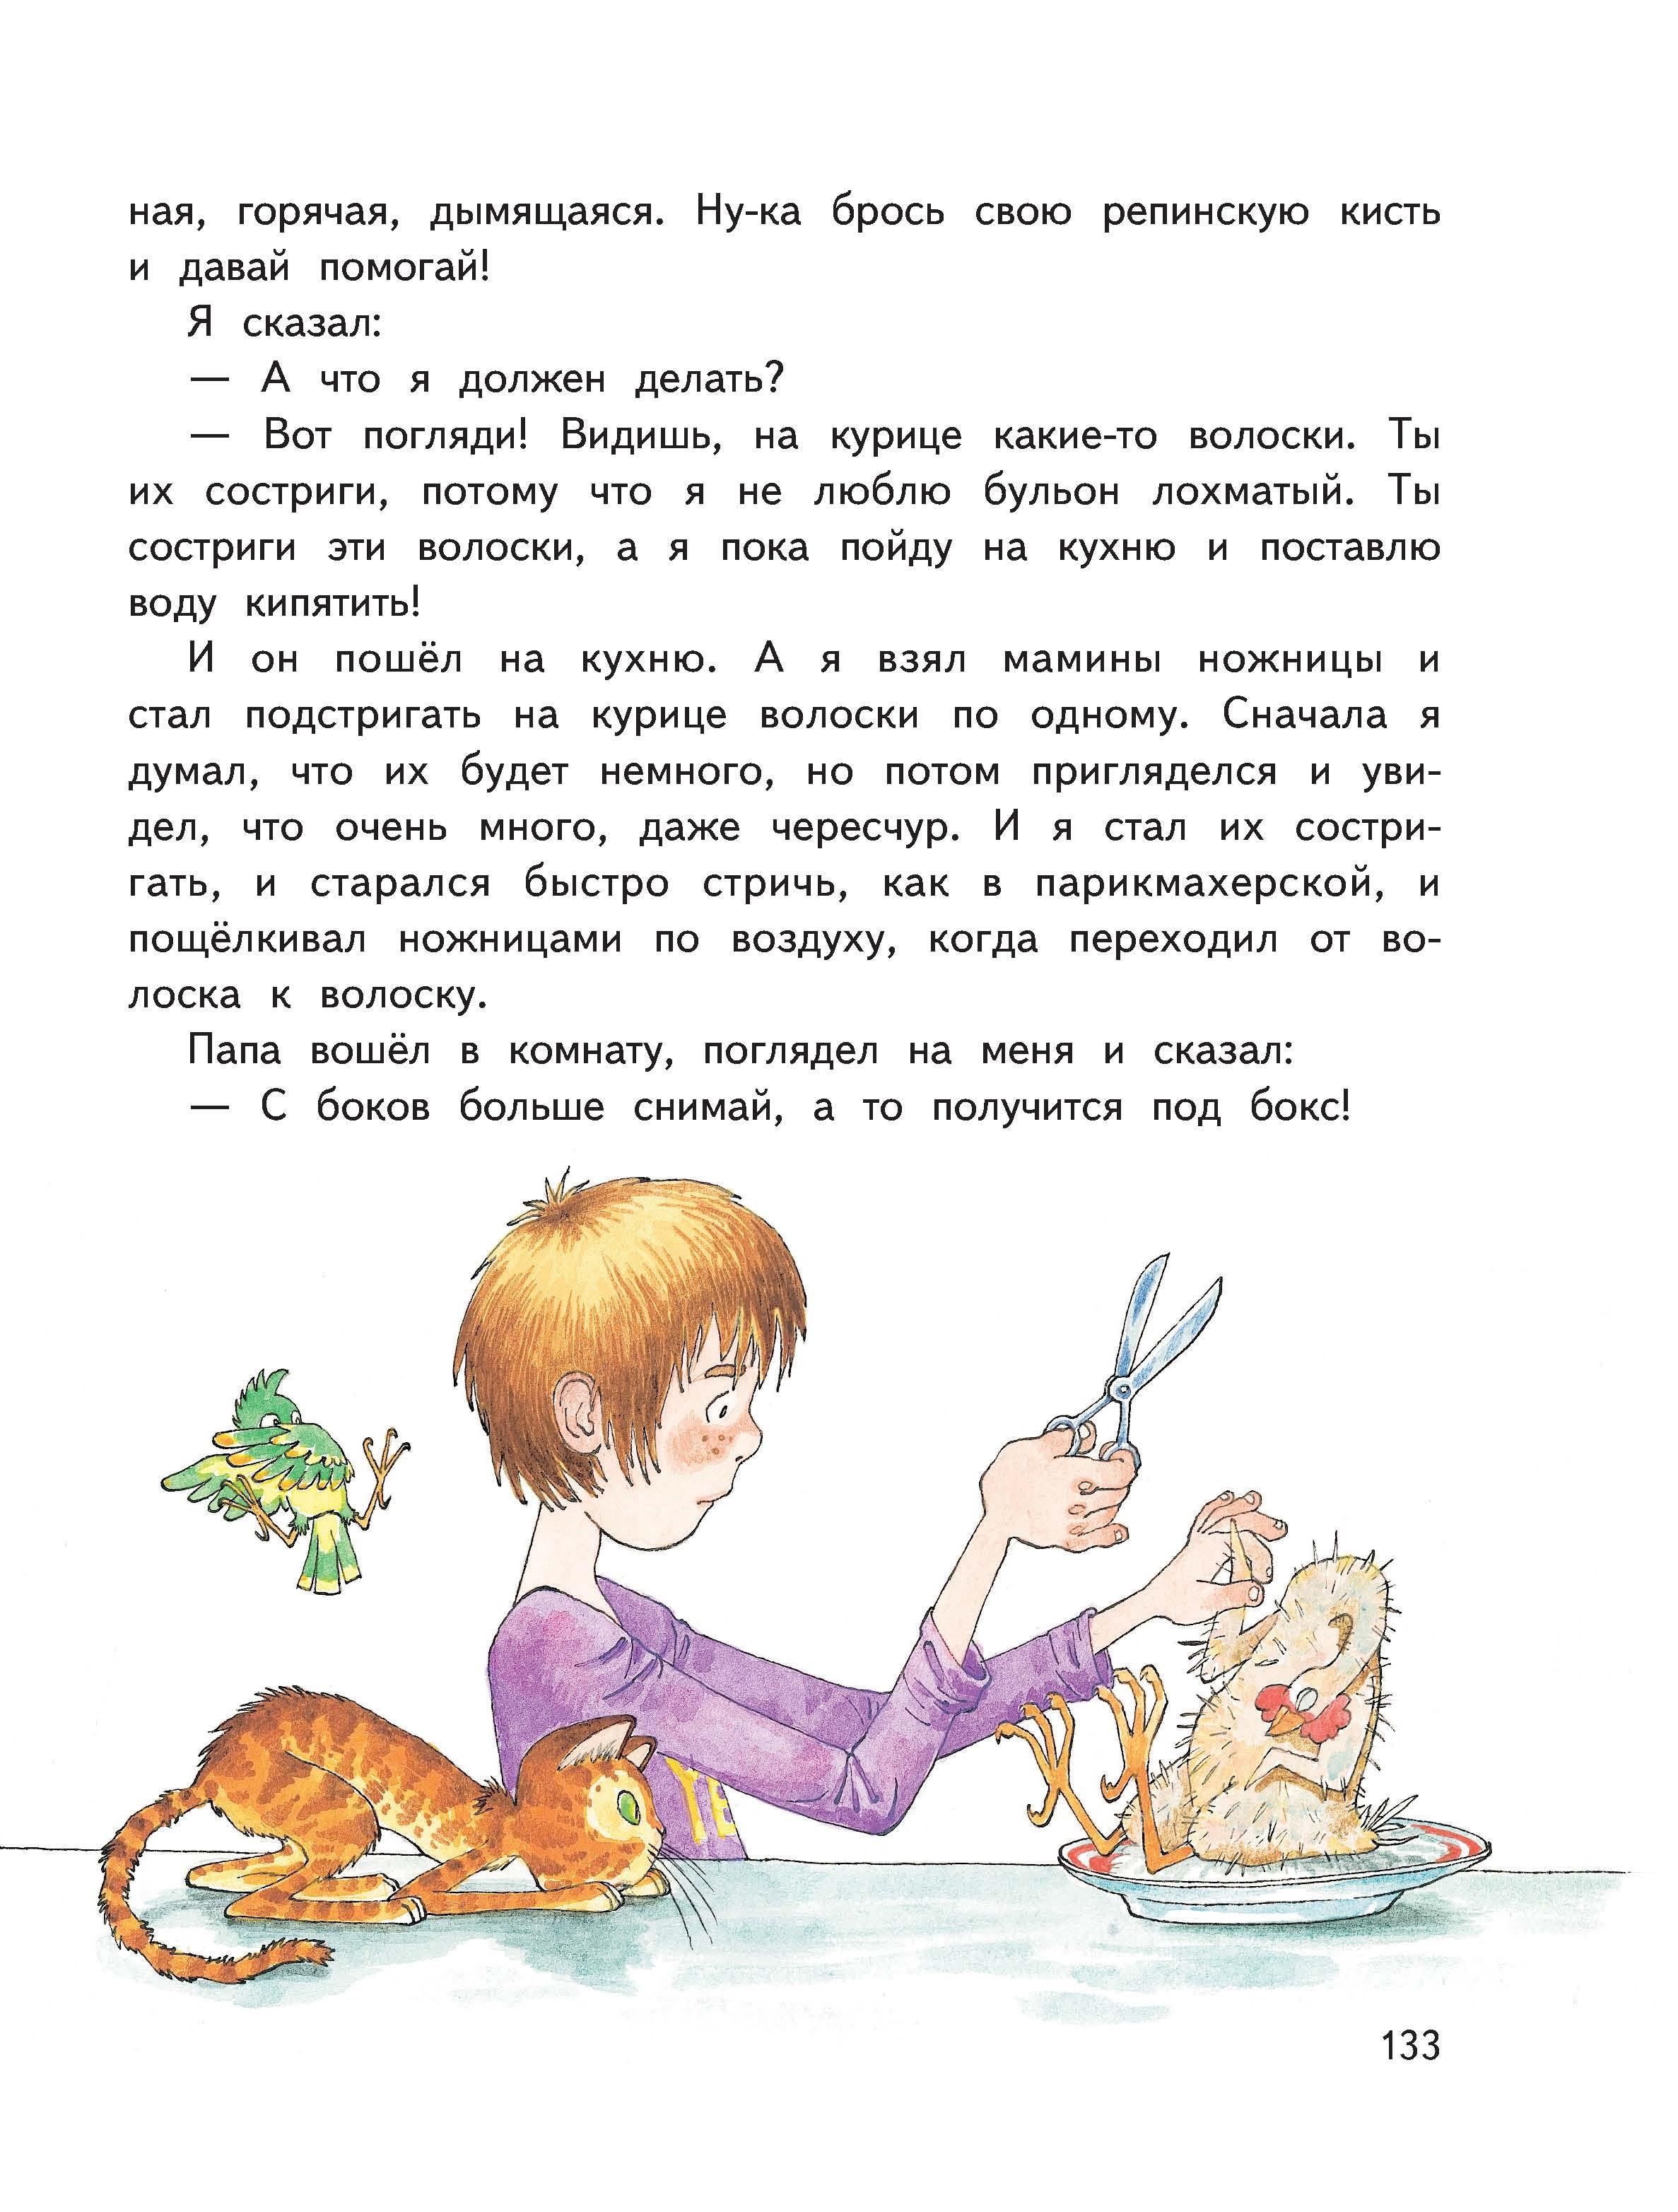 http://onyx.ru/wp-content/uploads/2017/08/драгунский-1.jpg